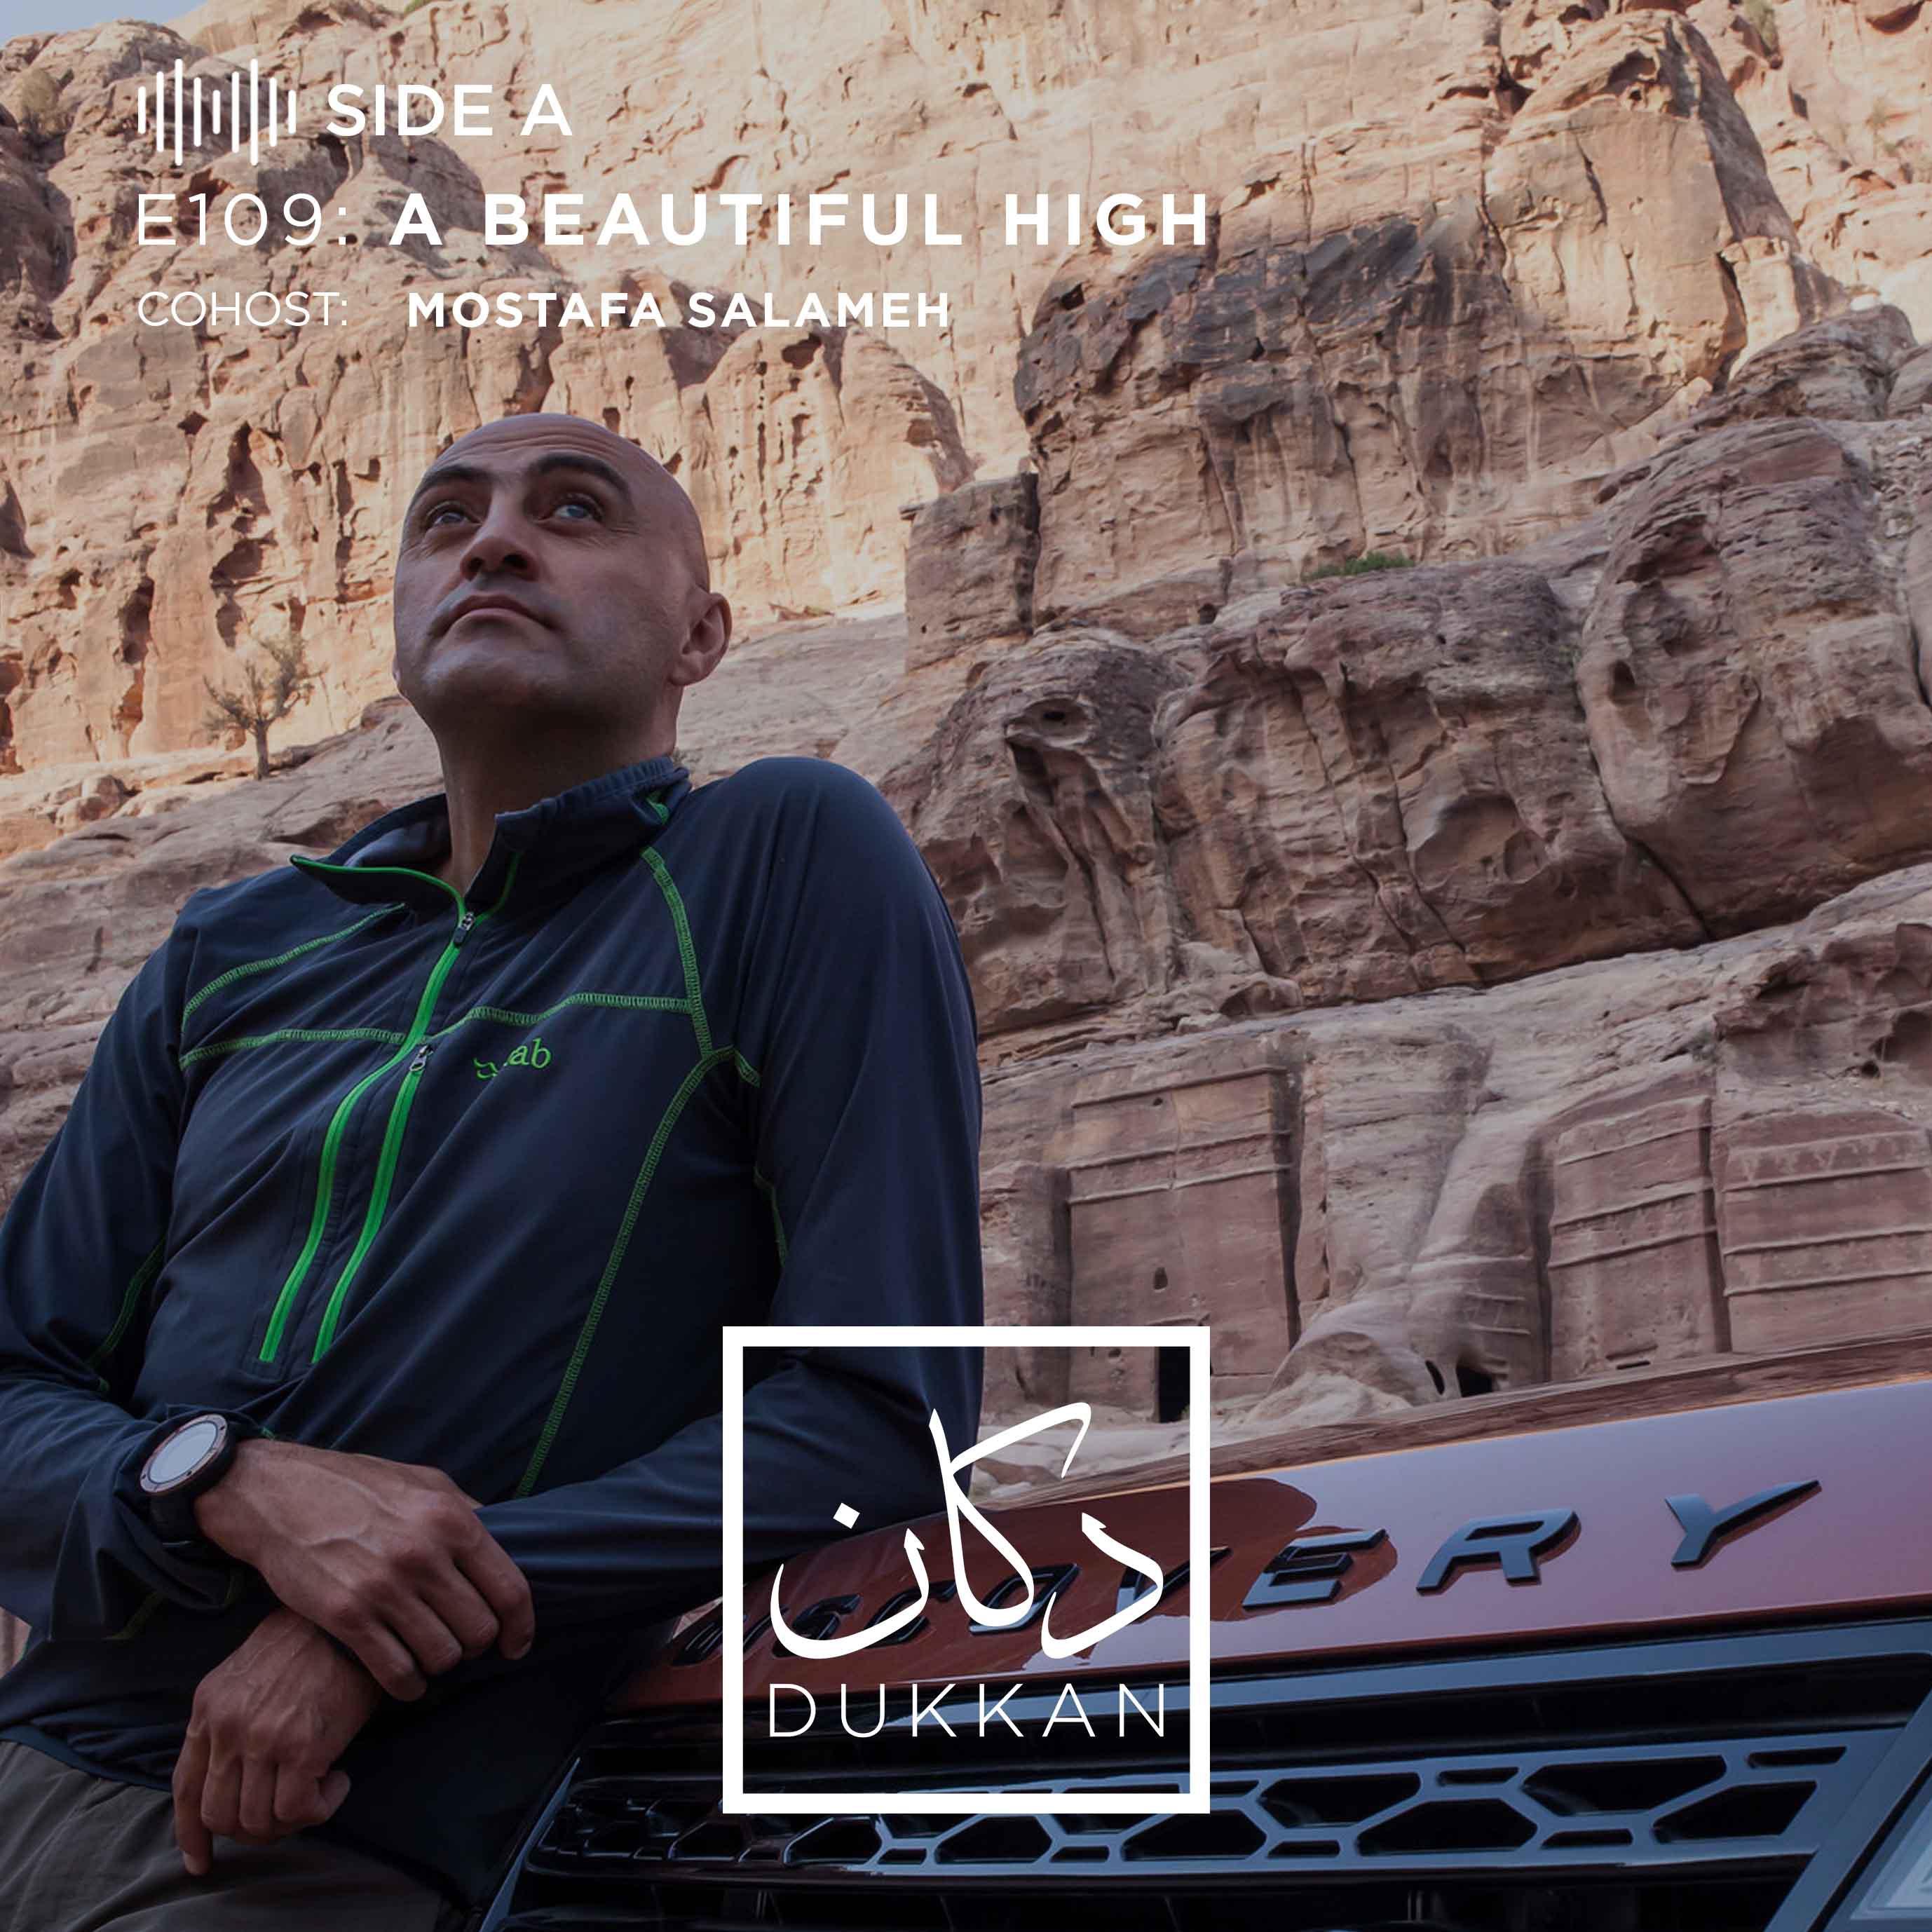 E109 - Side A: A Beautiful High (Cohost: Mostafa Salameh)